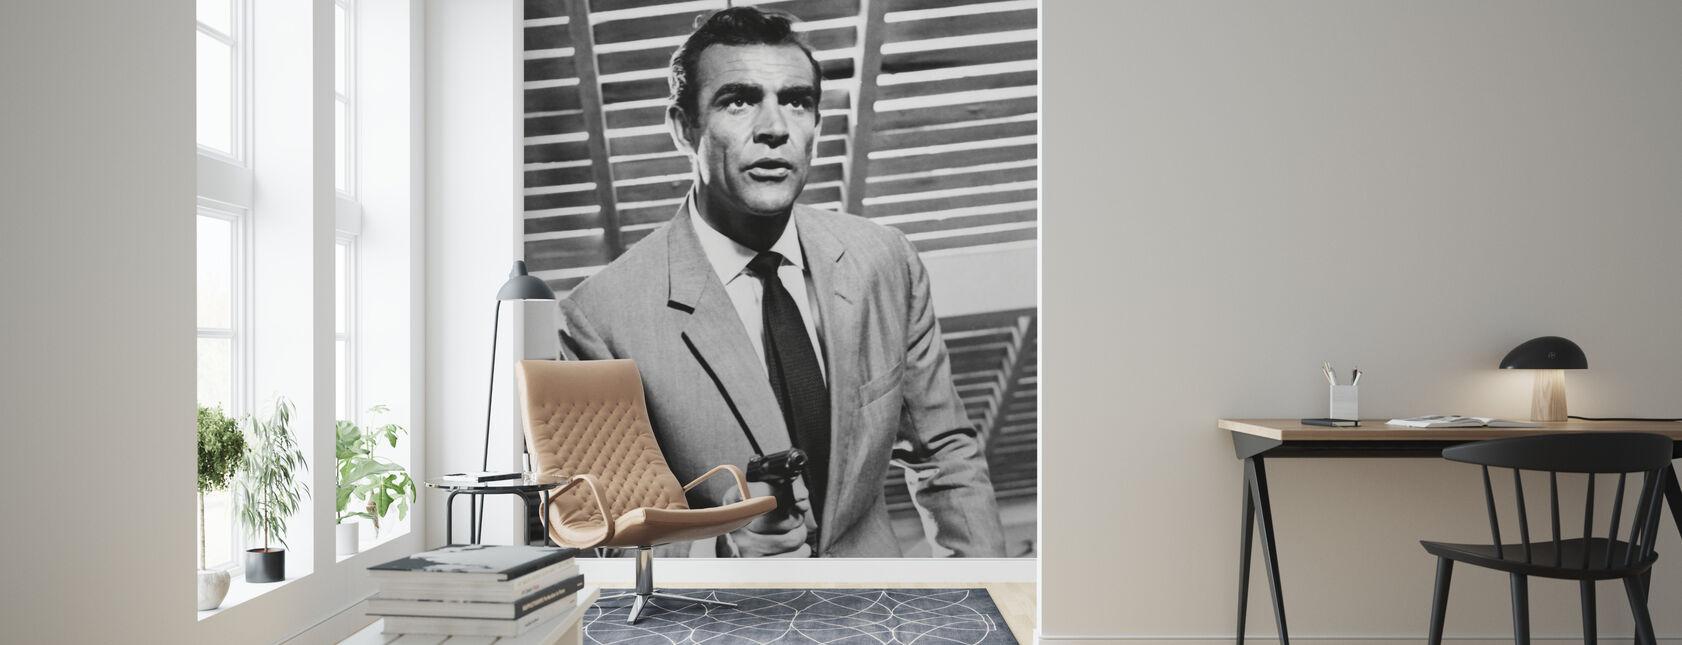 James Bond - Sean Connery - Tapetti - Olohuone